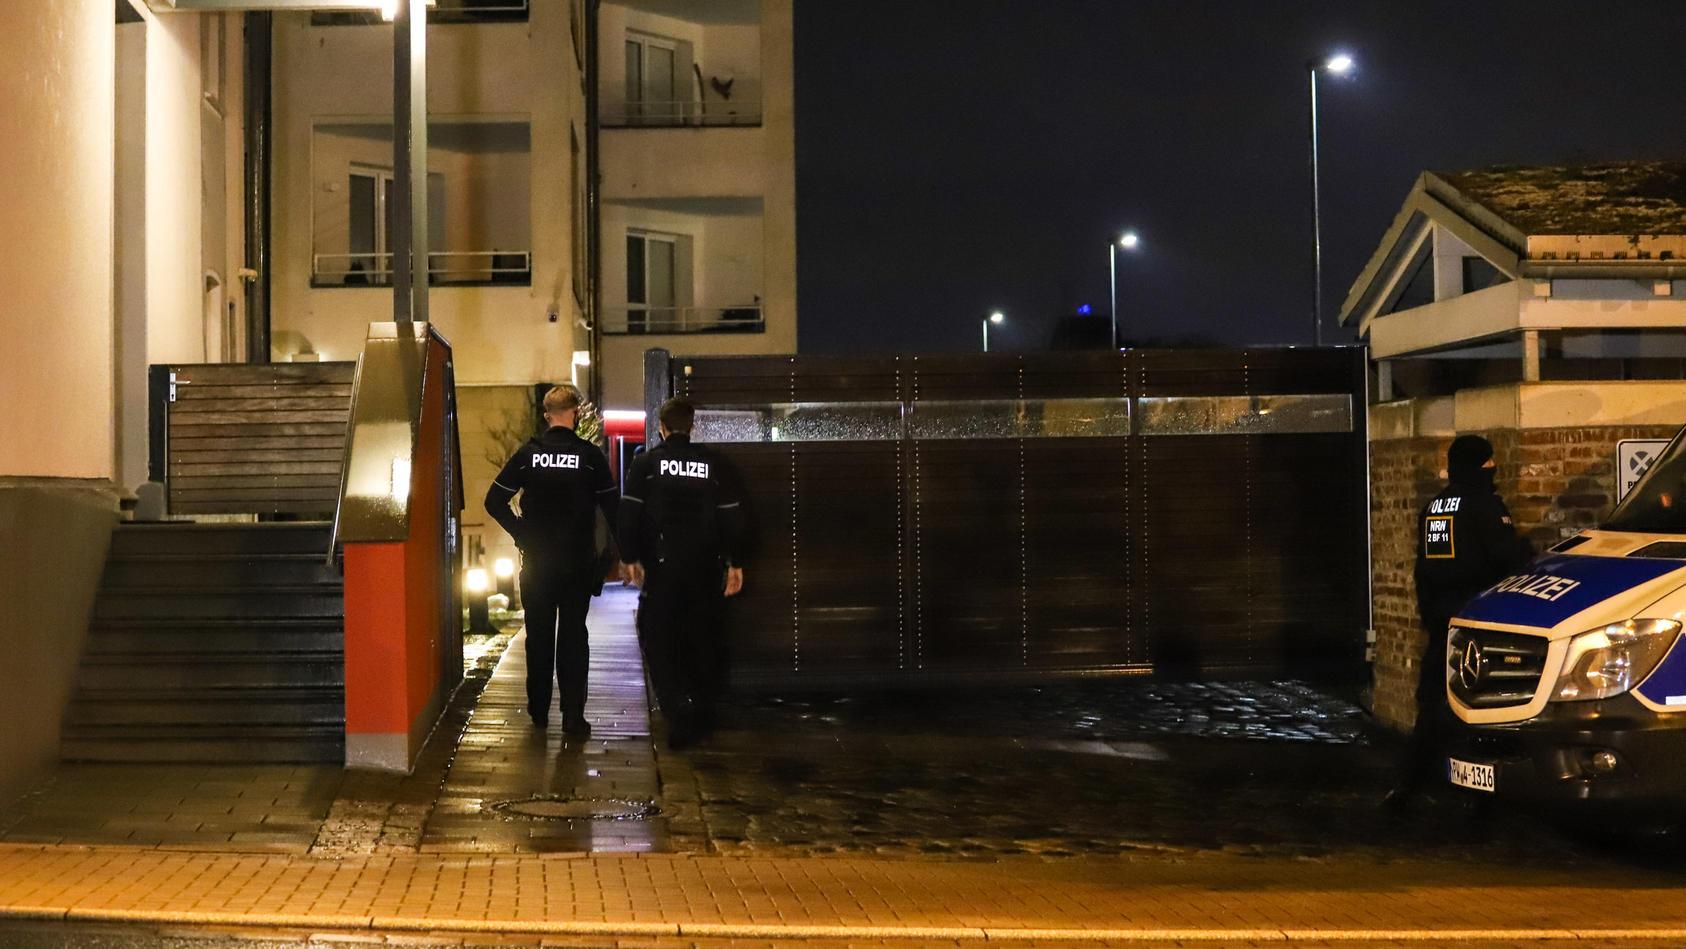 Bundesweite Razzia gegen Kinderpornografie - 65 Verdächtige